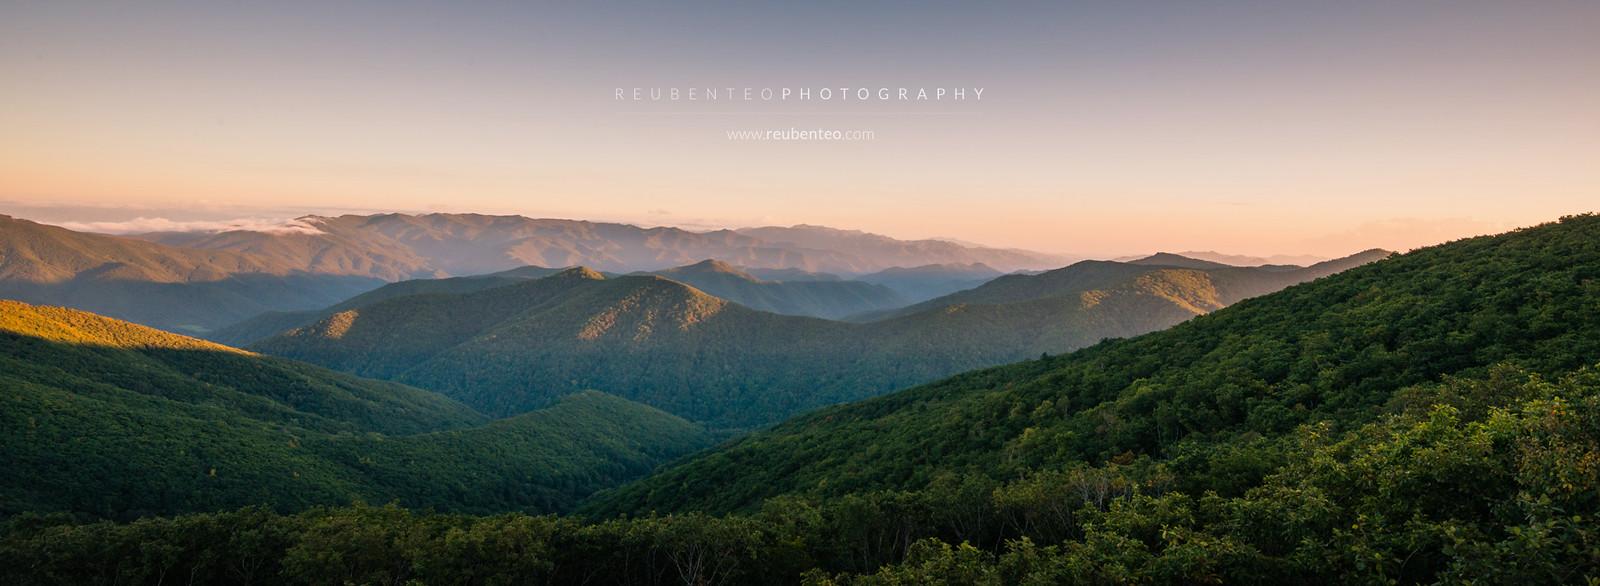 Taehwa Peak at Masikryong